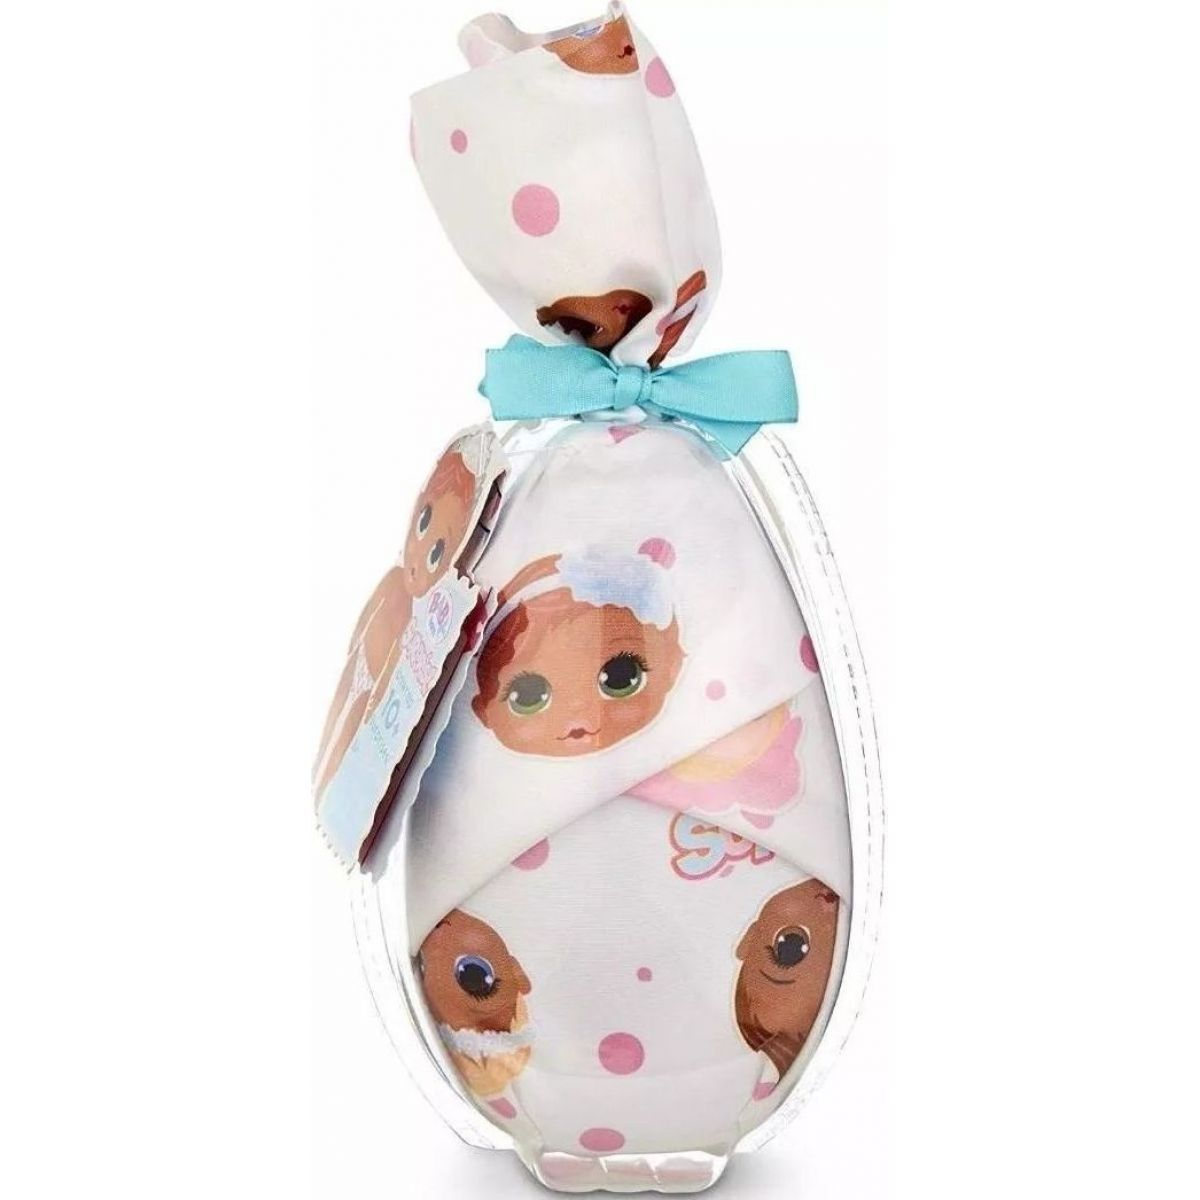 Zapf Creation BABY born Surprise 3